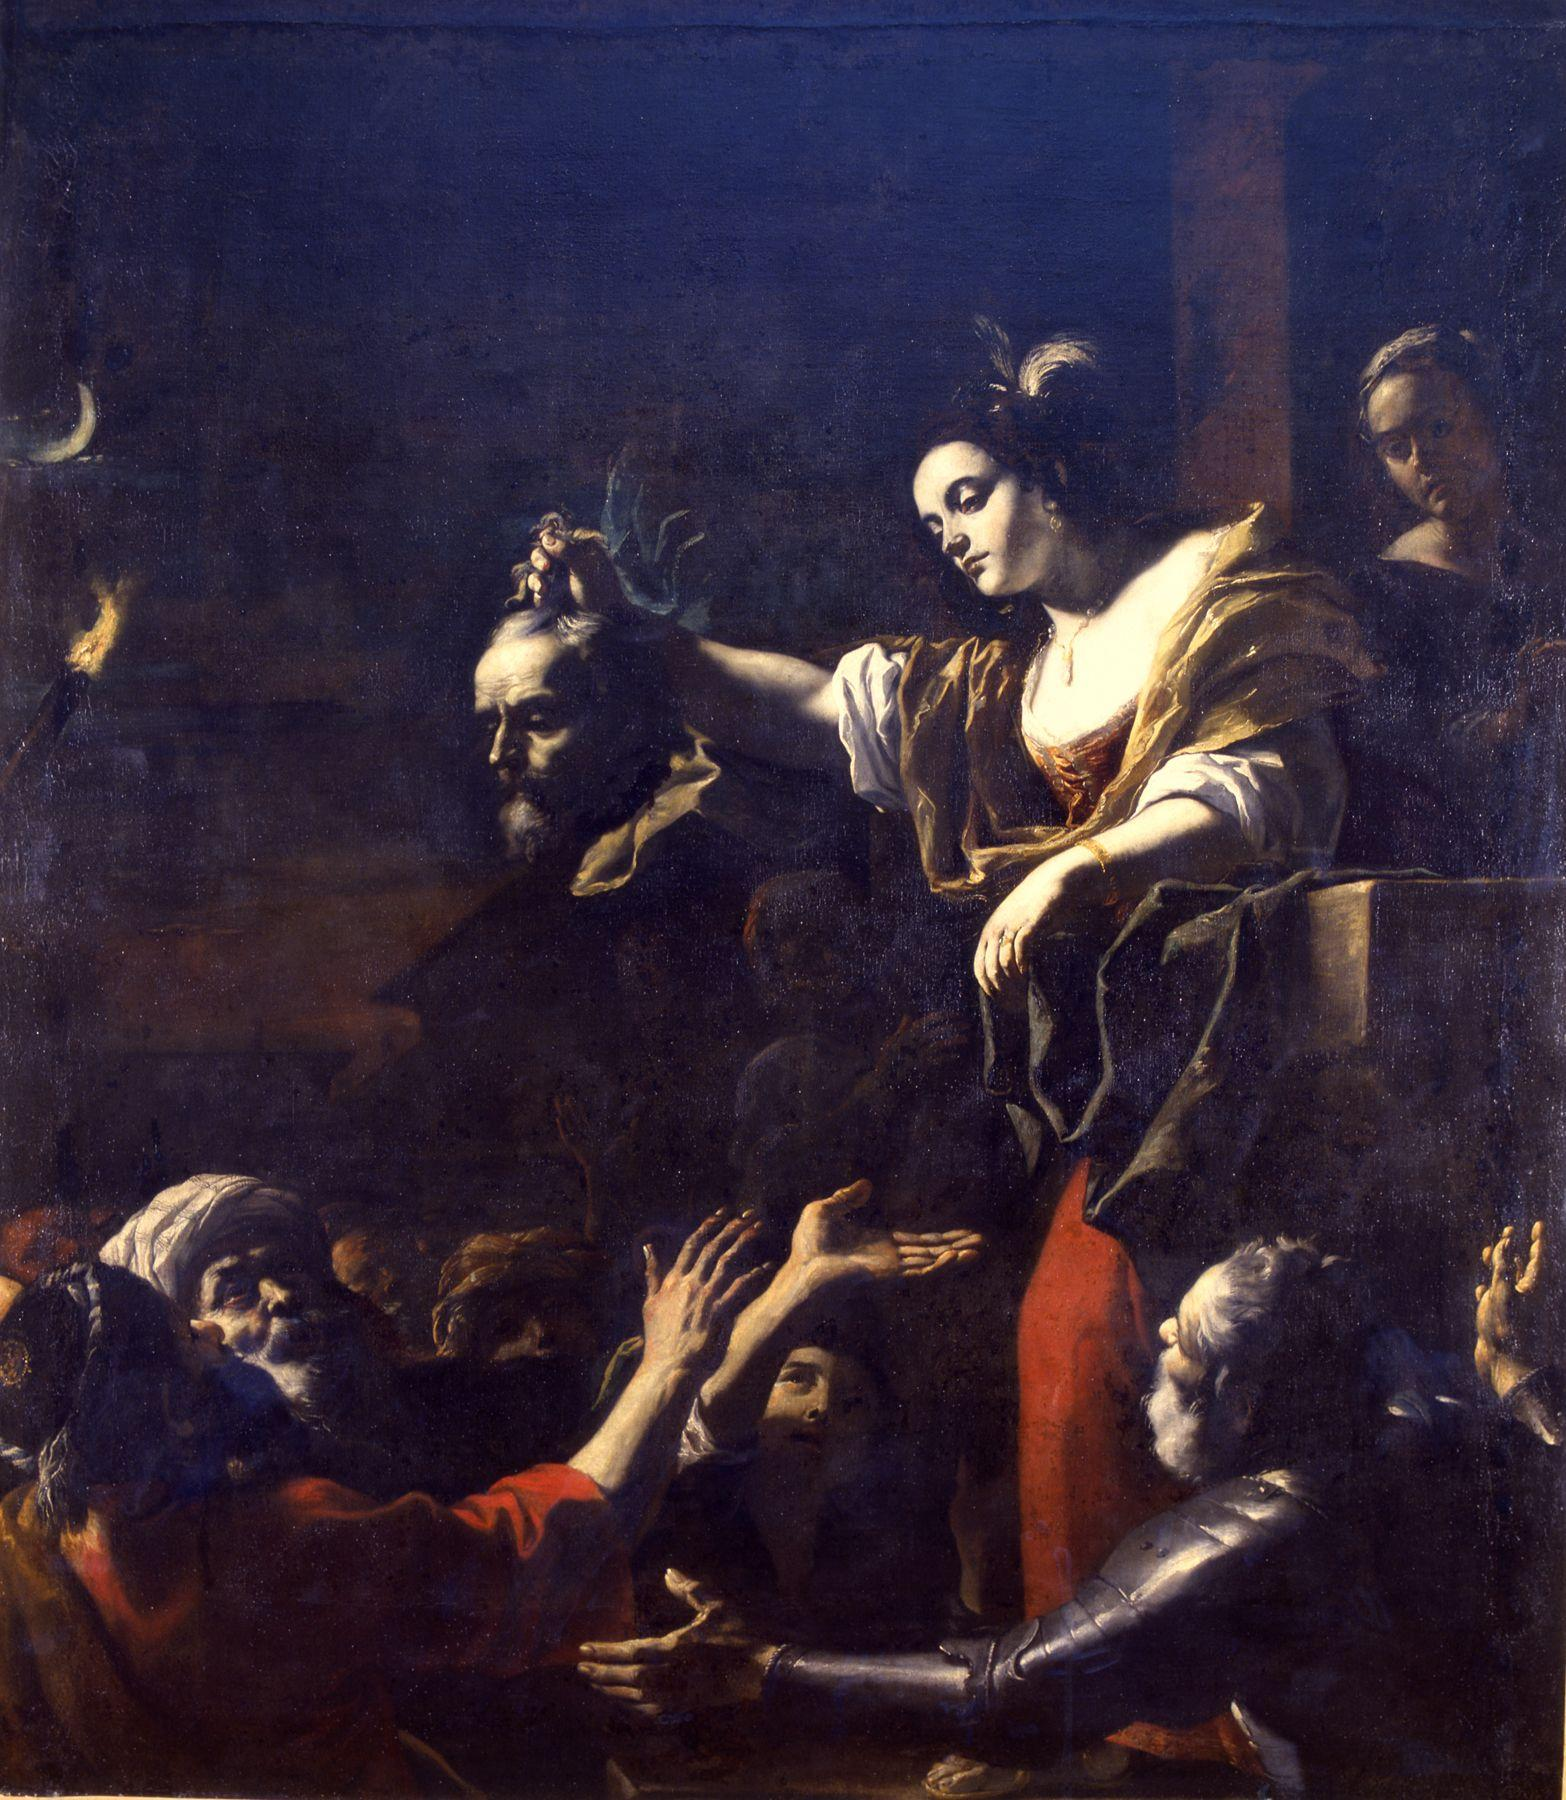 Preti 1651-1661 Judith montrant la tete d Holopherne Musee de Chambery